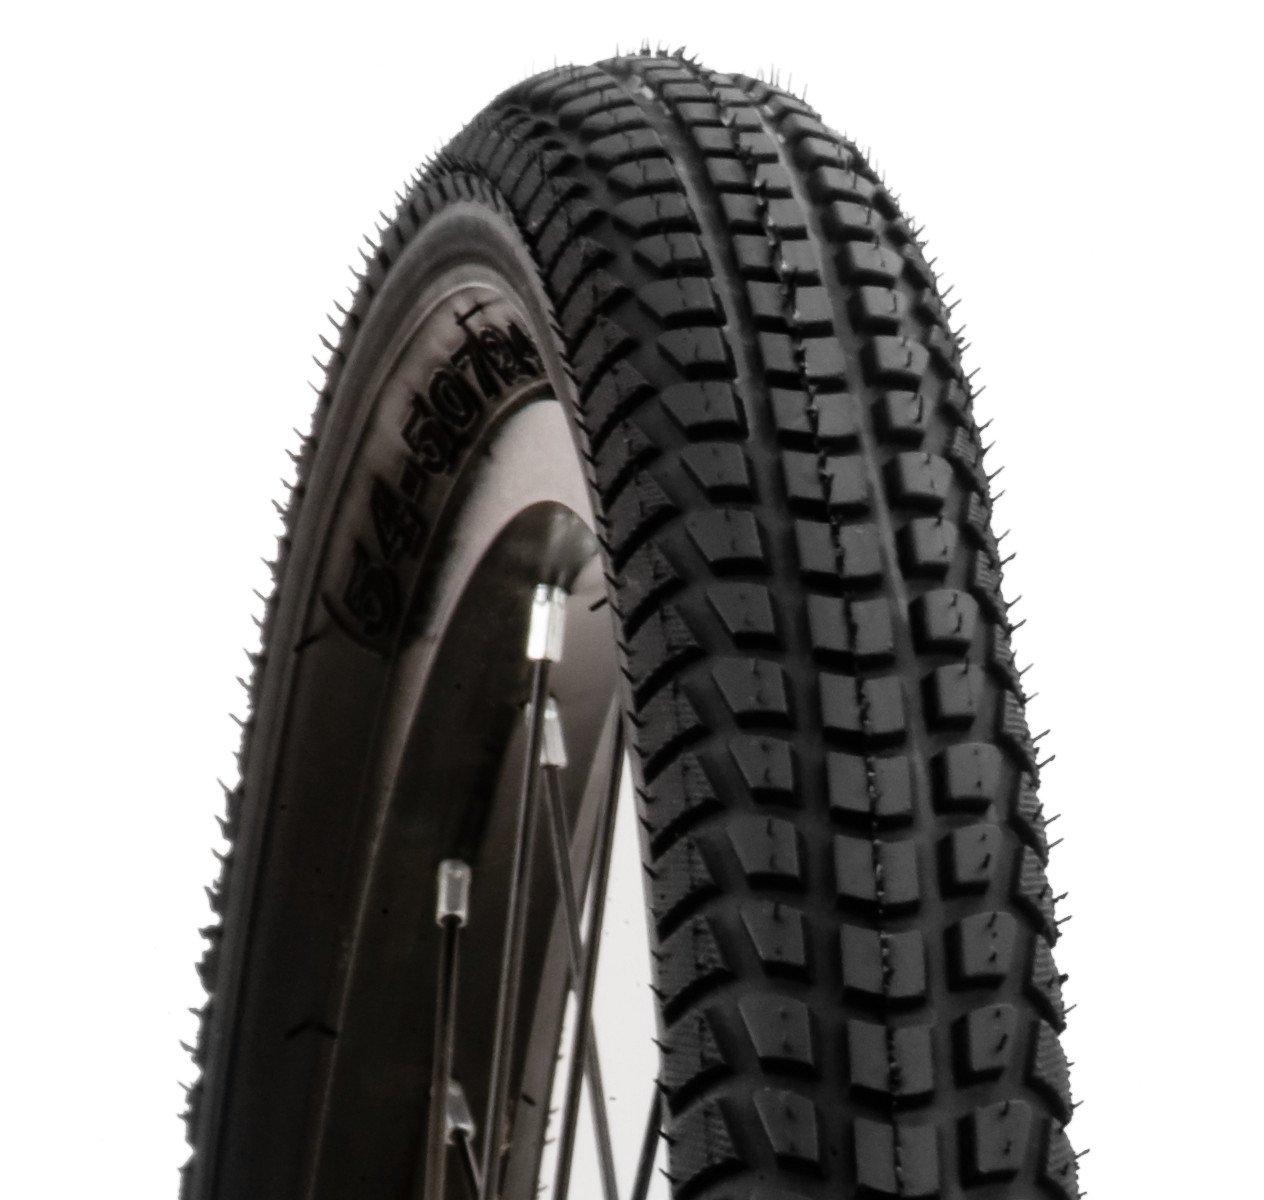 Bike Hybrid Tires Street Comfort Bike Tire